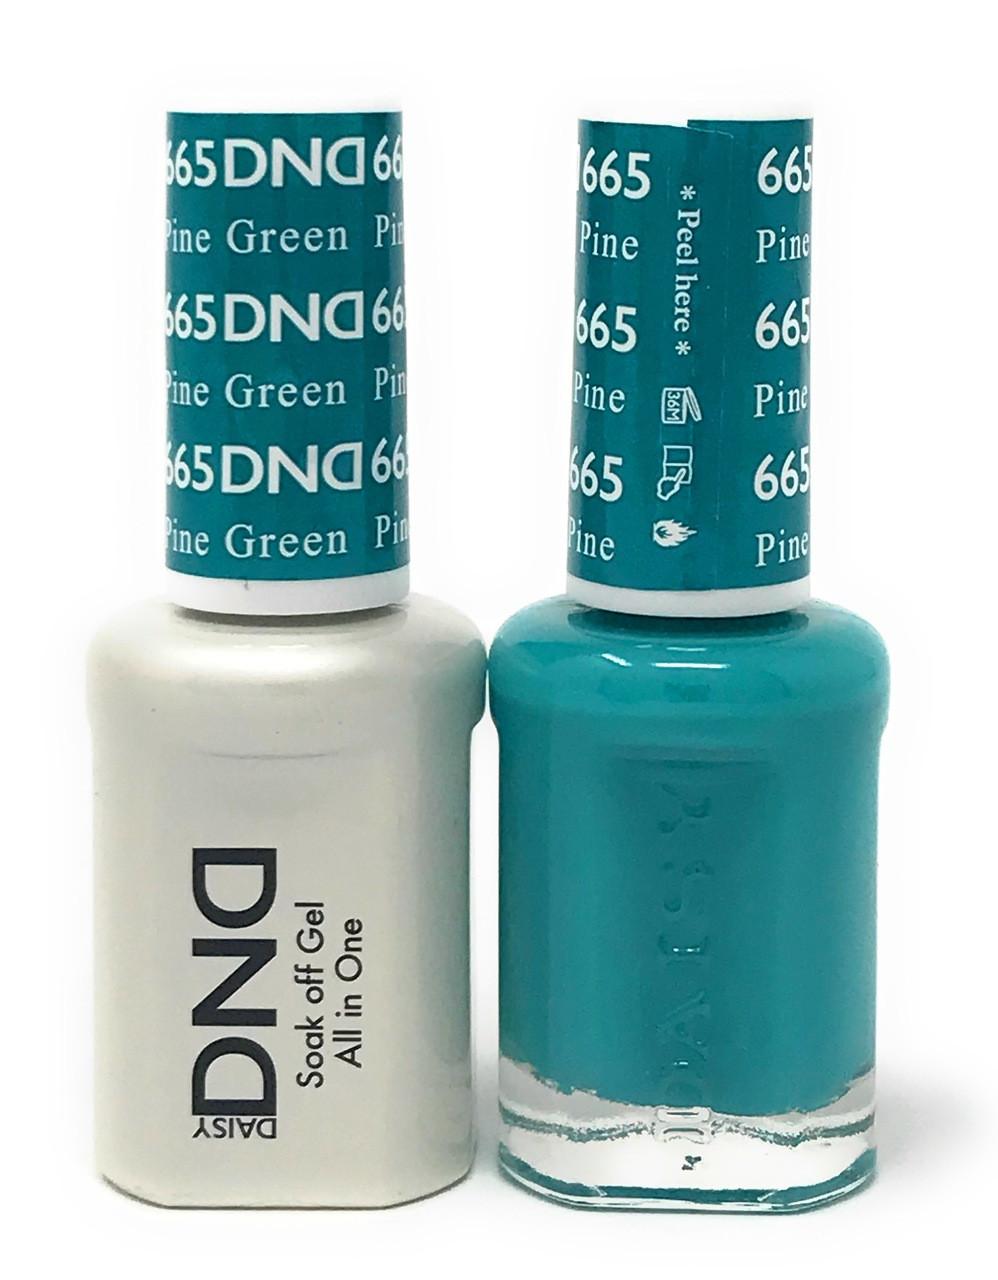 Dnd Soak Off Gel Polish Duo Diva Collection Pine Green 665